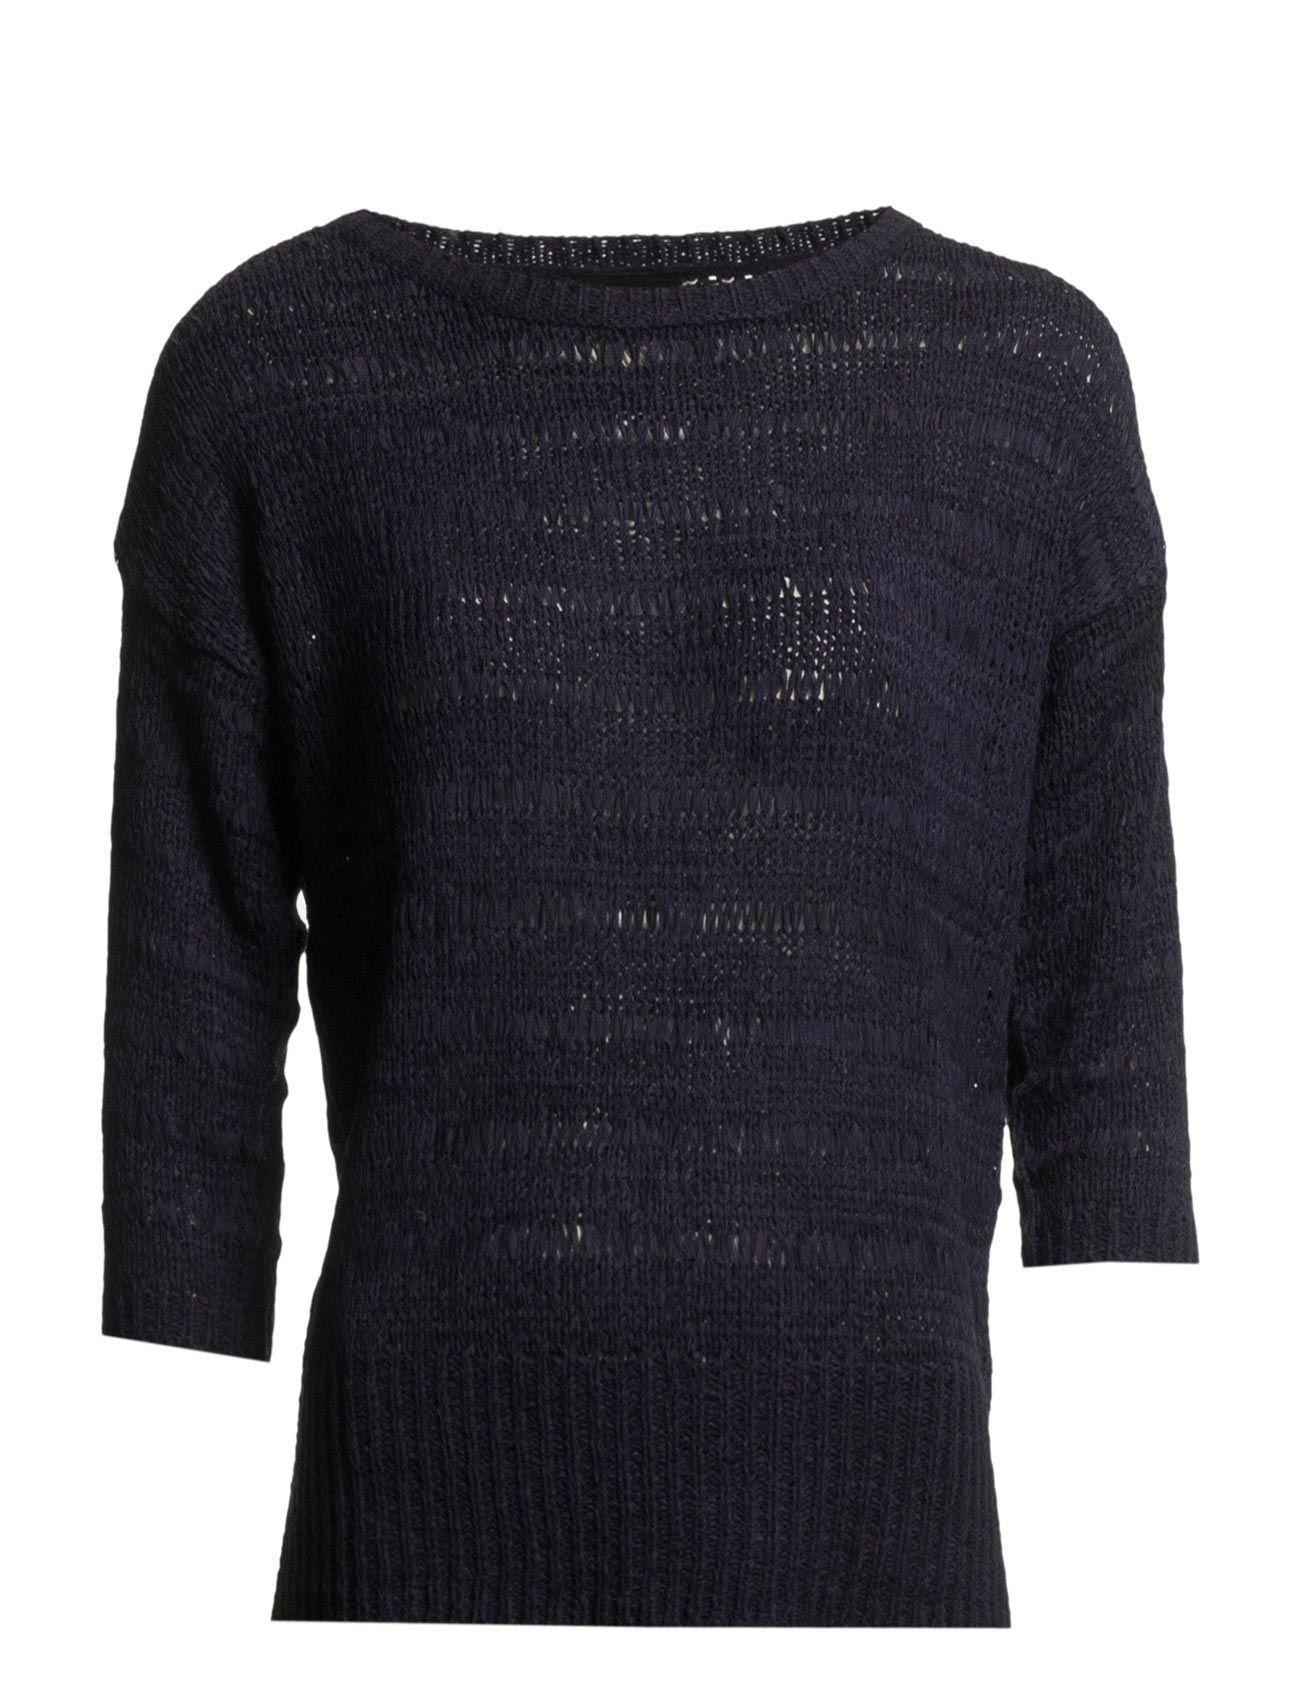 Eba 1 Pullover